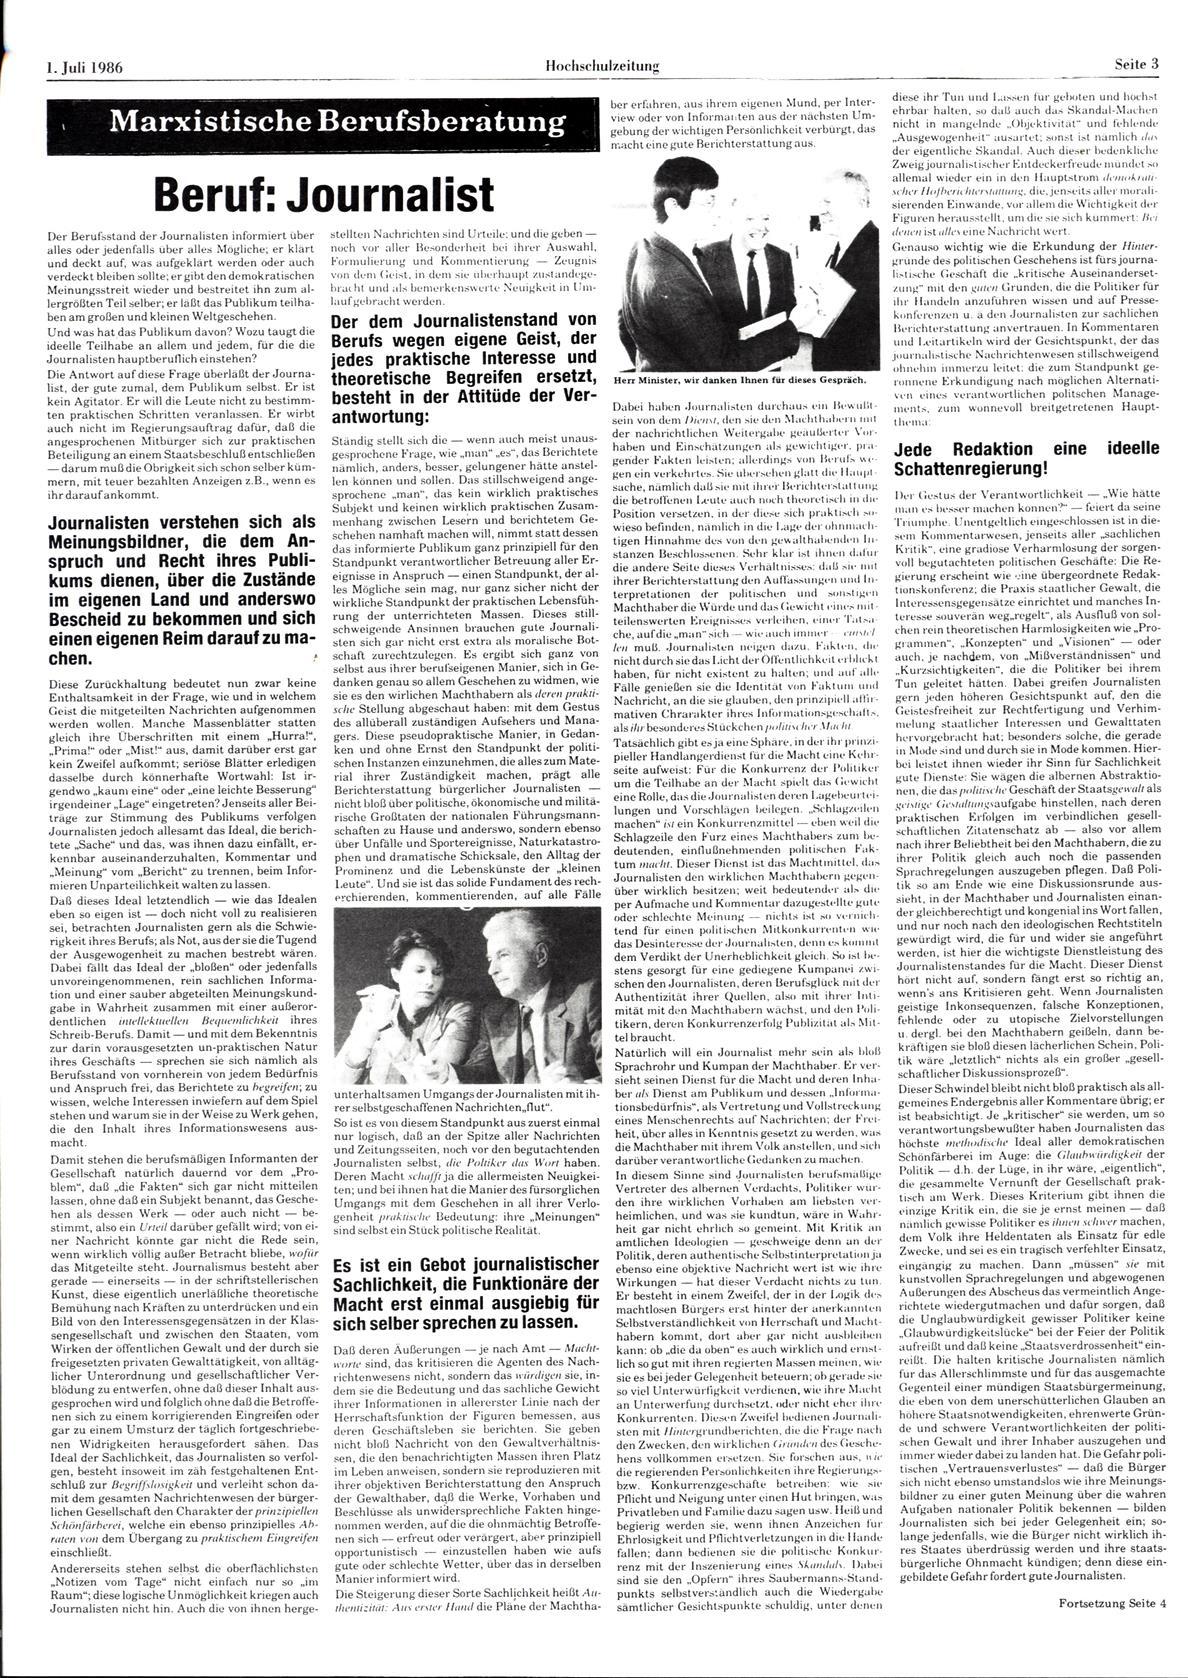 Bochum_BHZ_19860701_133_003